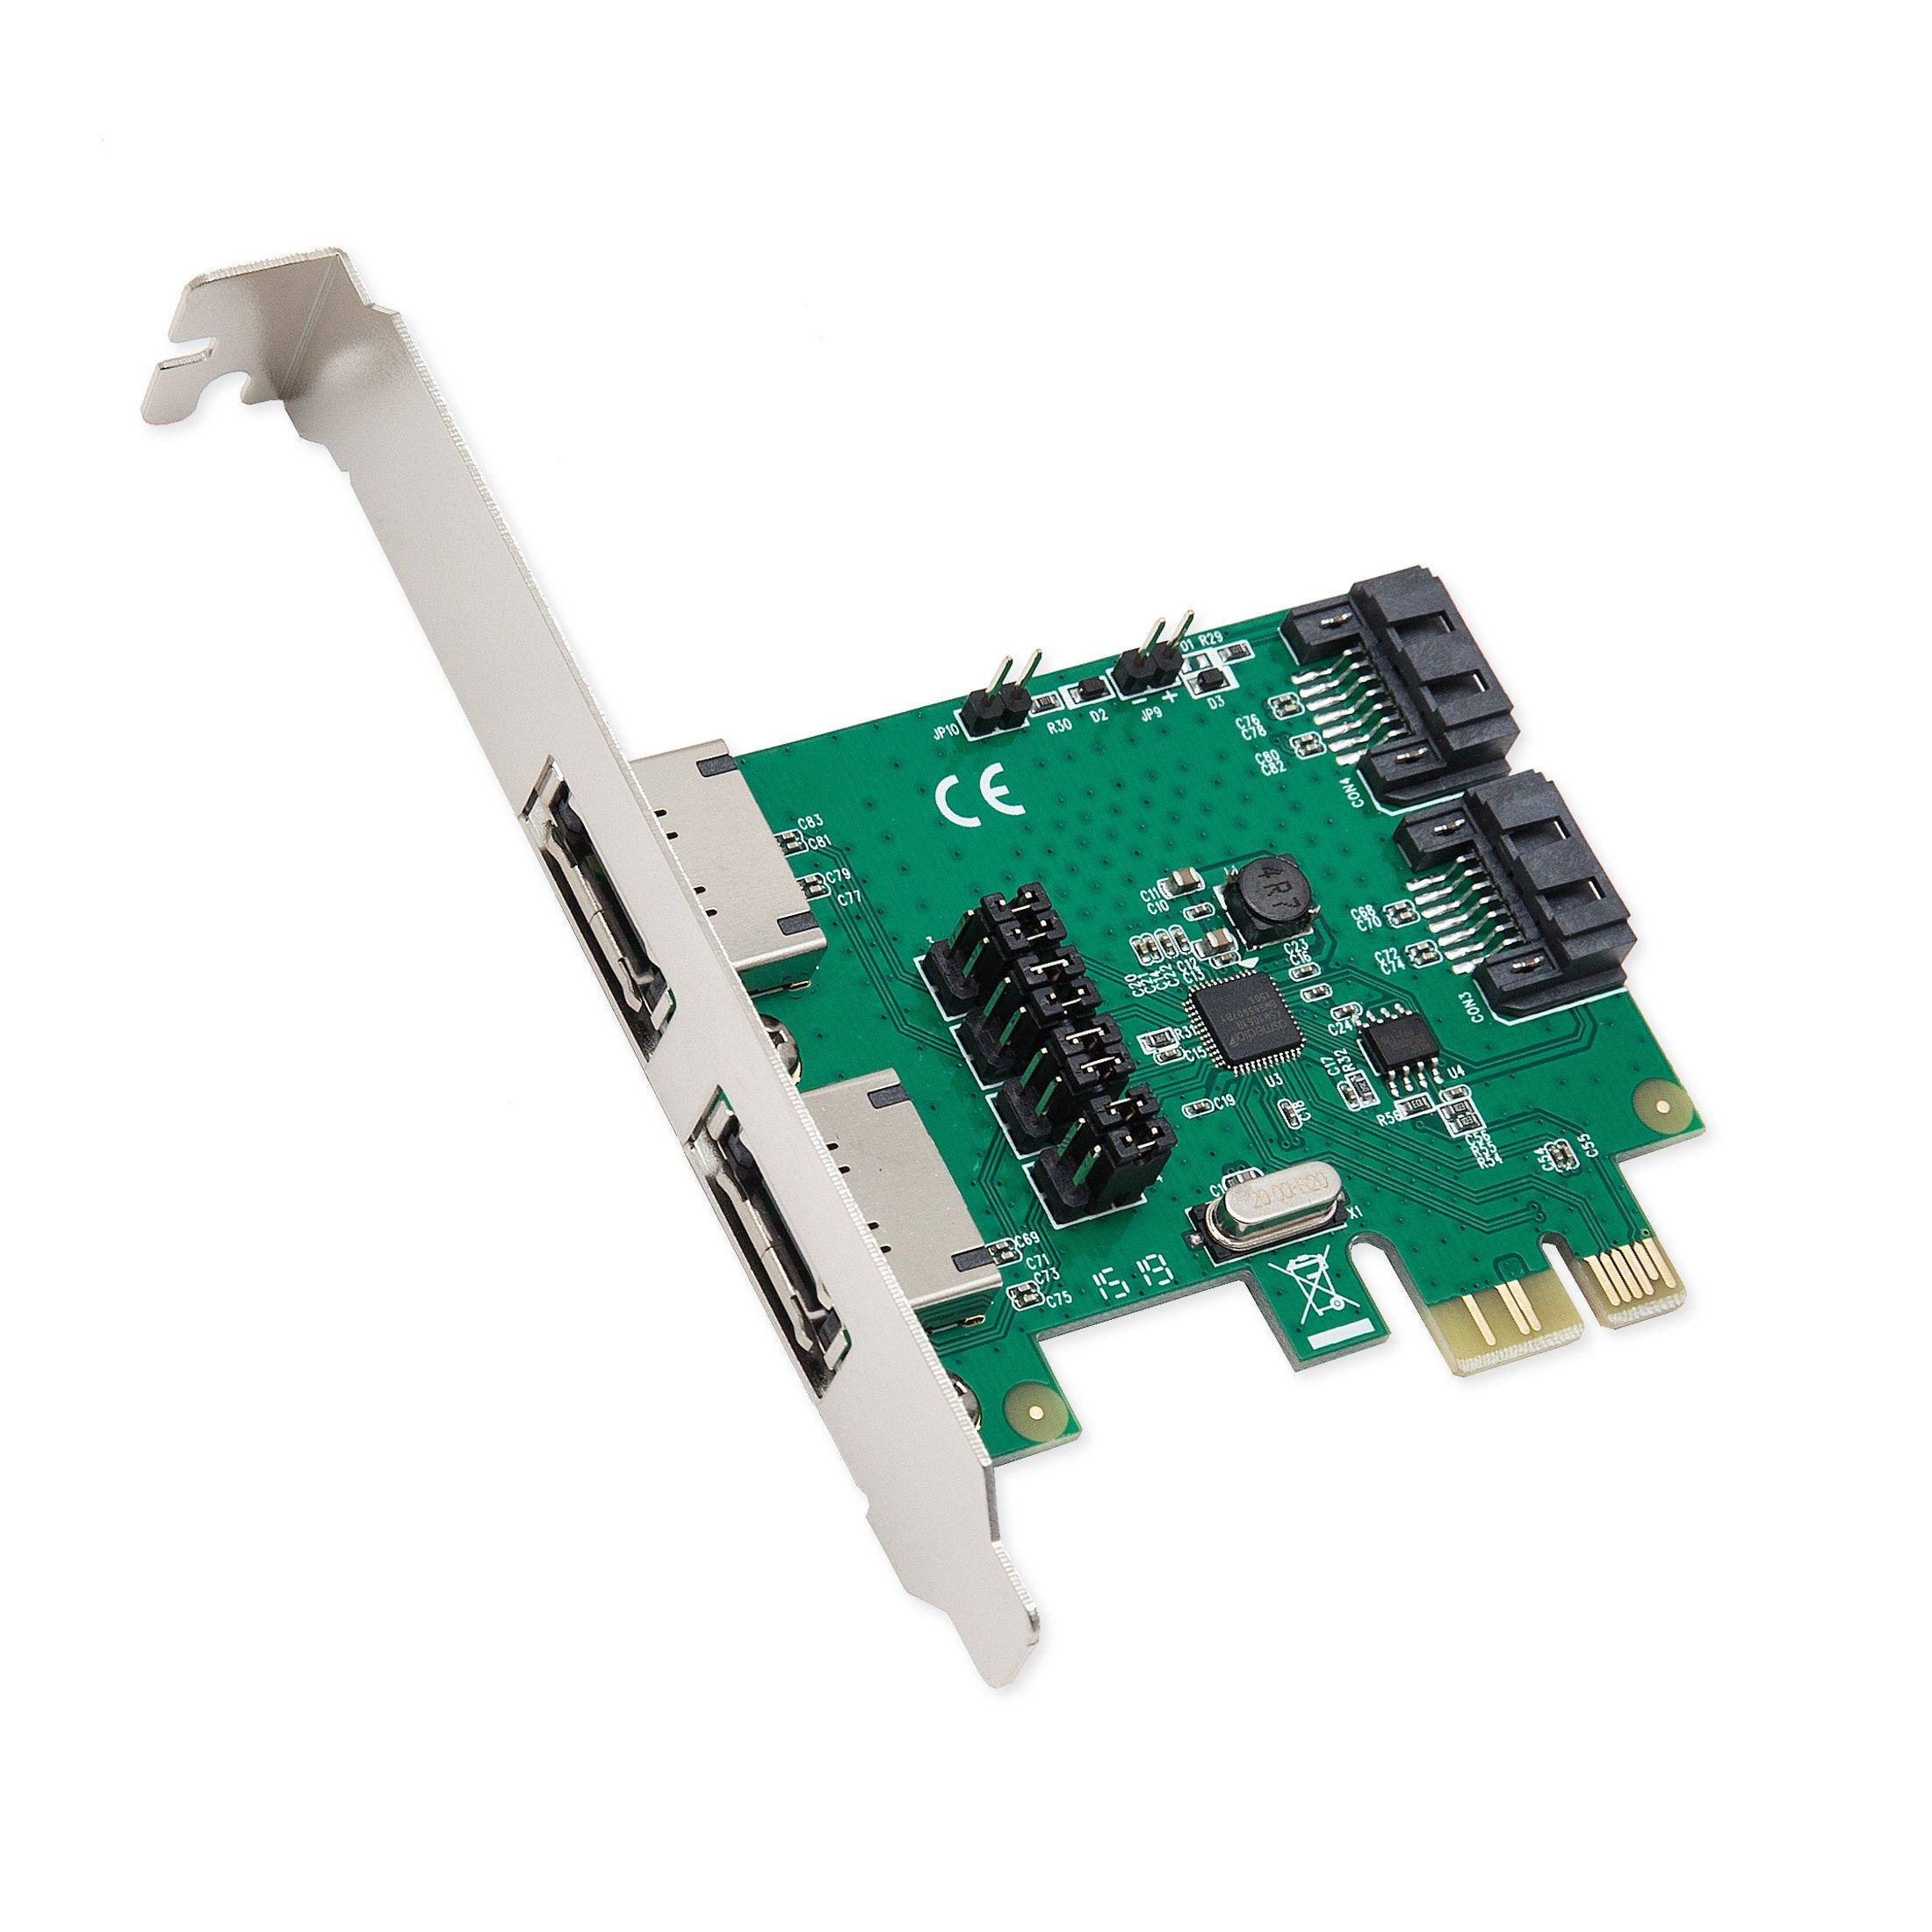 Syba SD-PEX40100 2 Port SATA III or 2 Port eSATA IIPCIe 2.0 x1 Controller Card